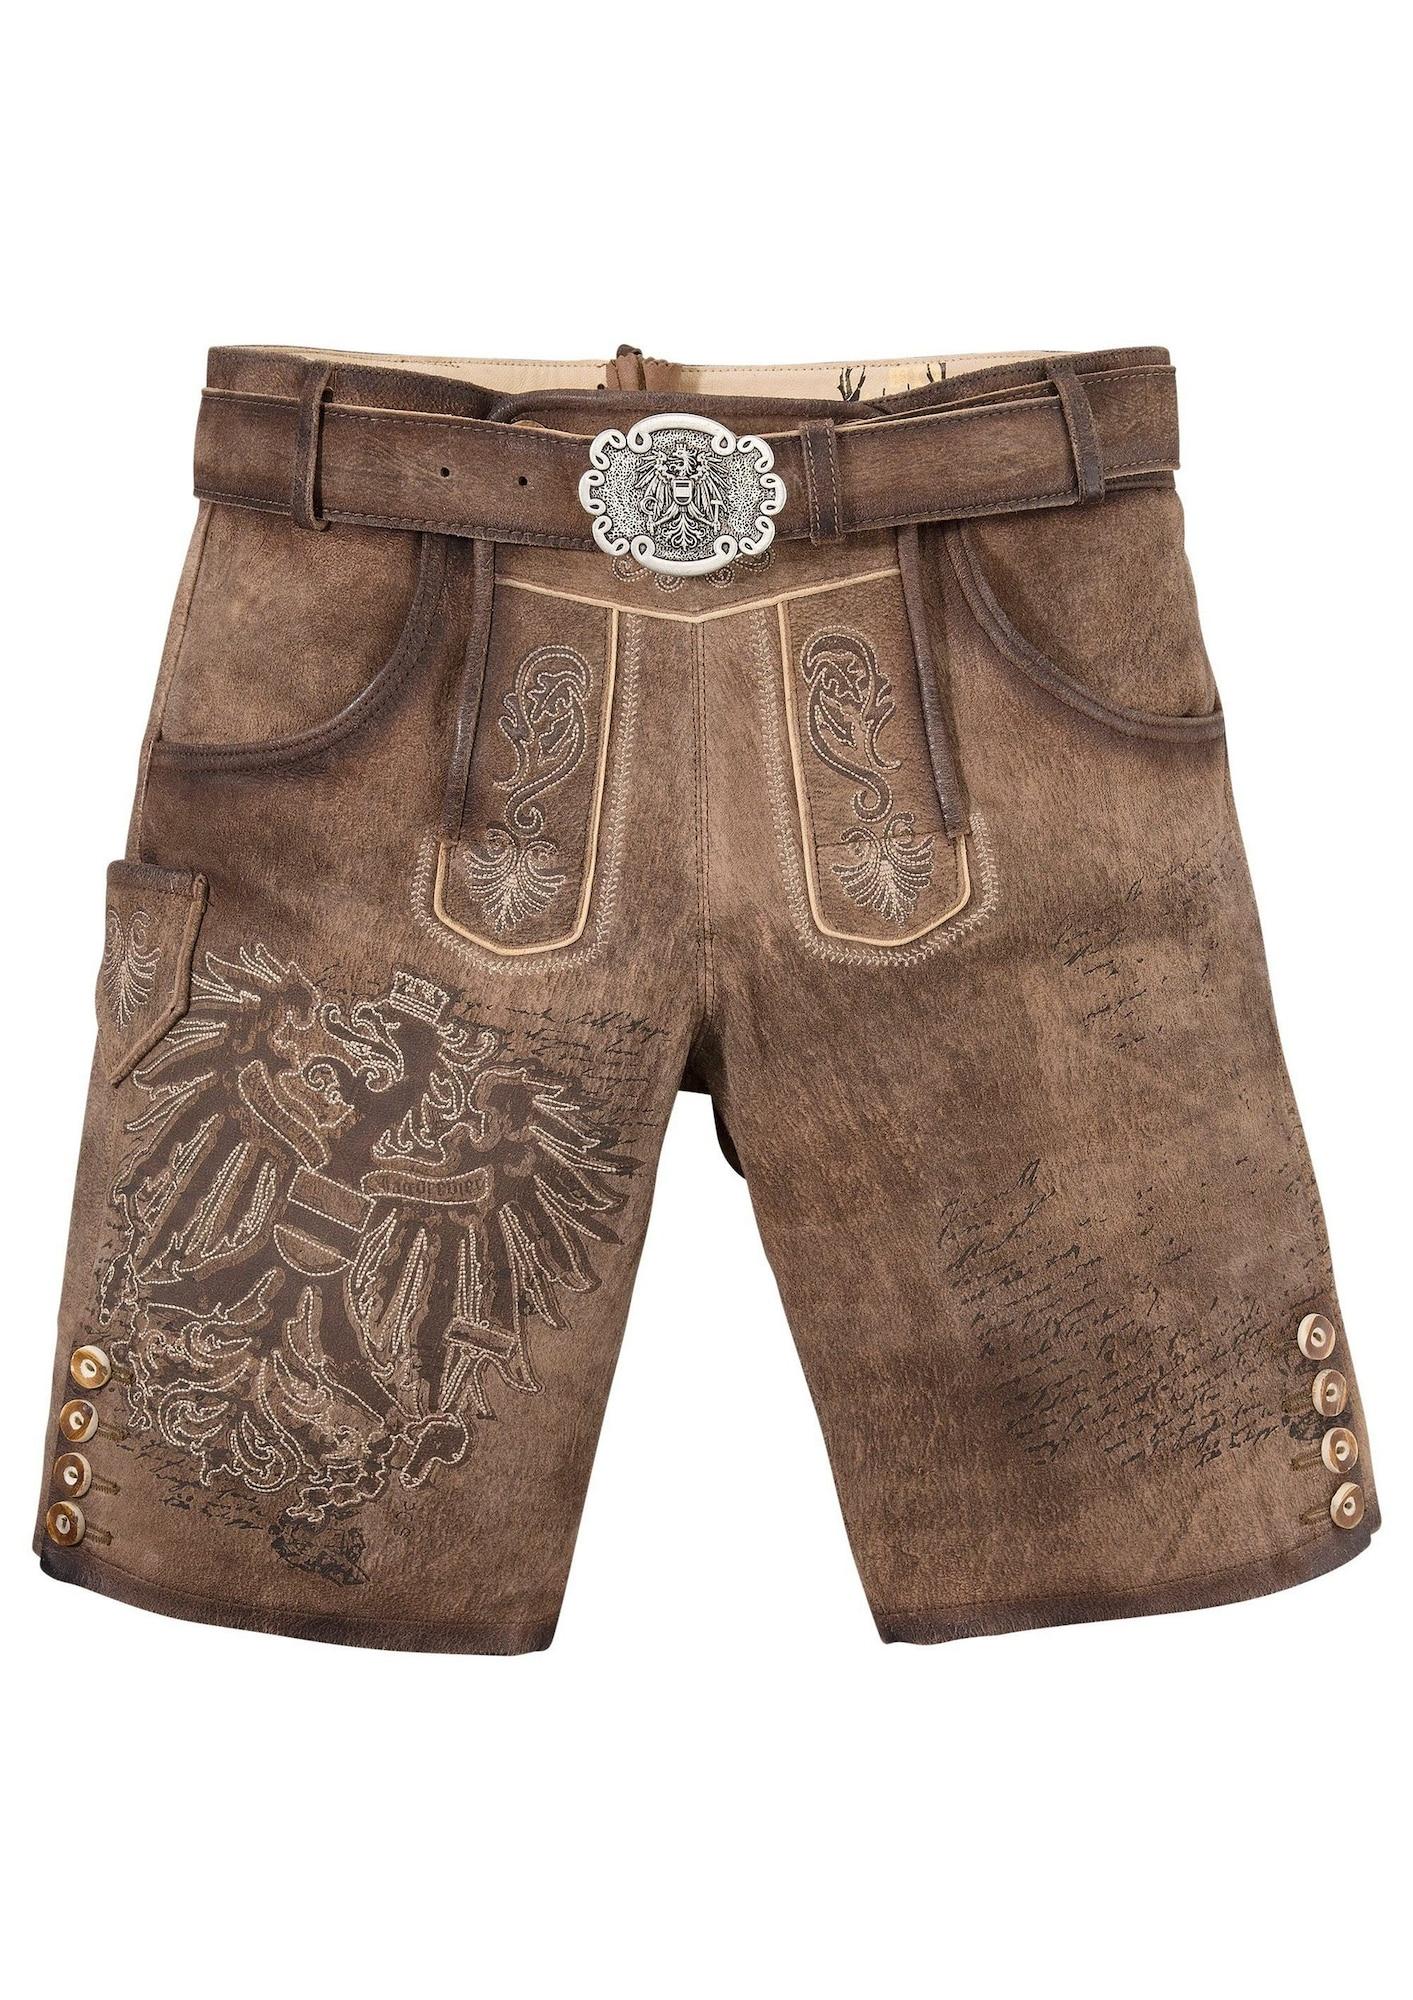 Trachtenhose | Bekleidung > Hosen > Trachtenhosen | Marjo